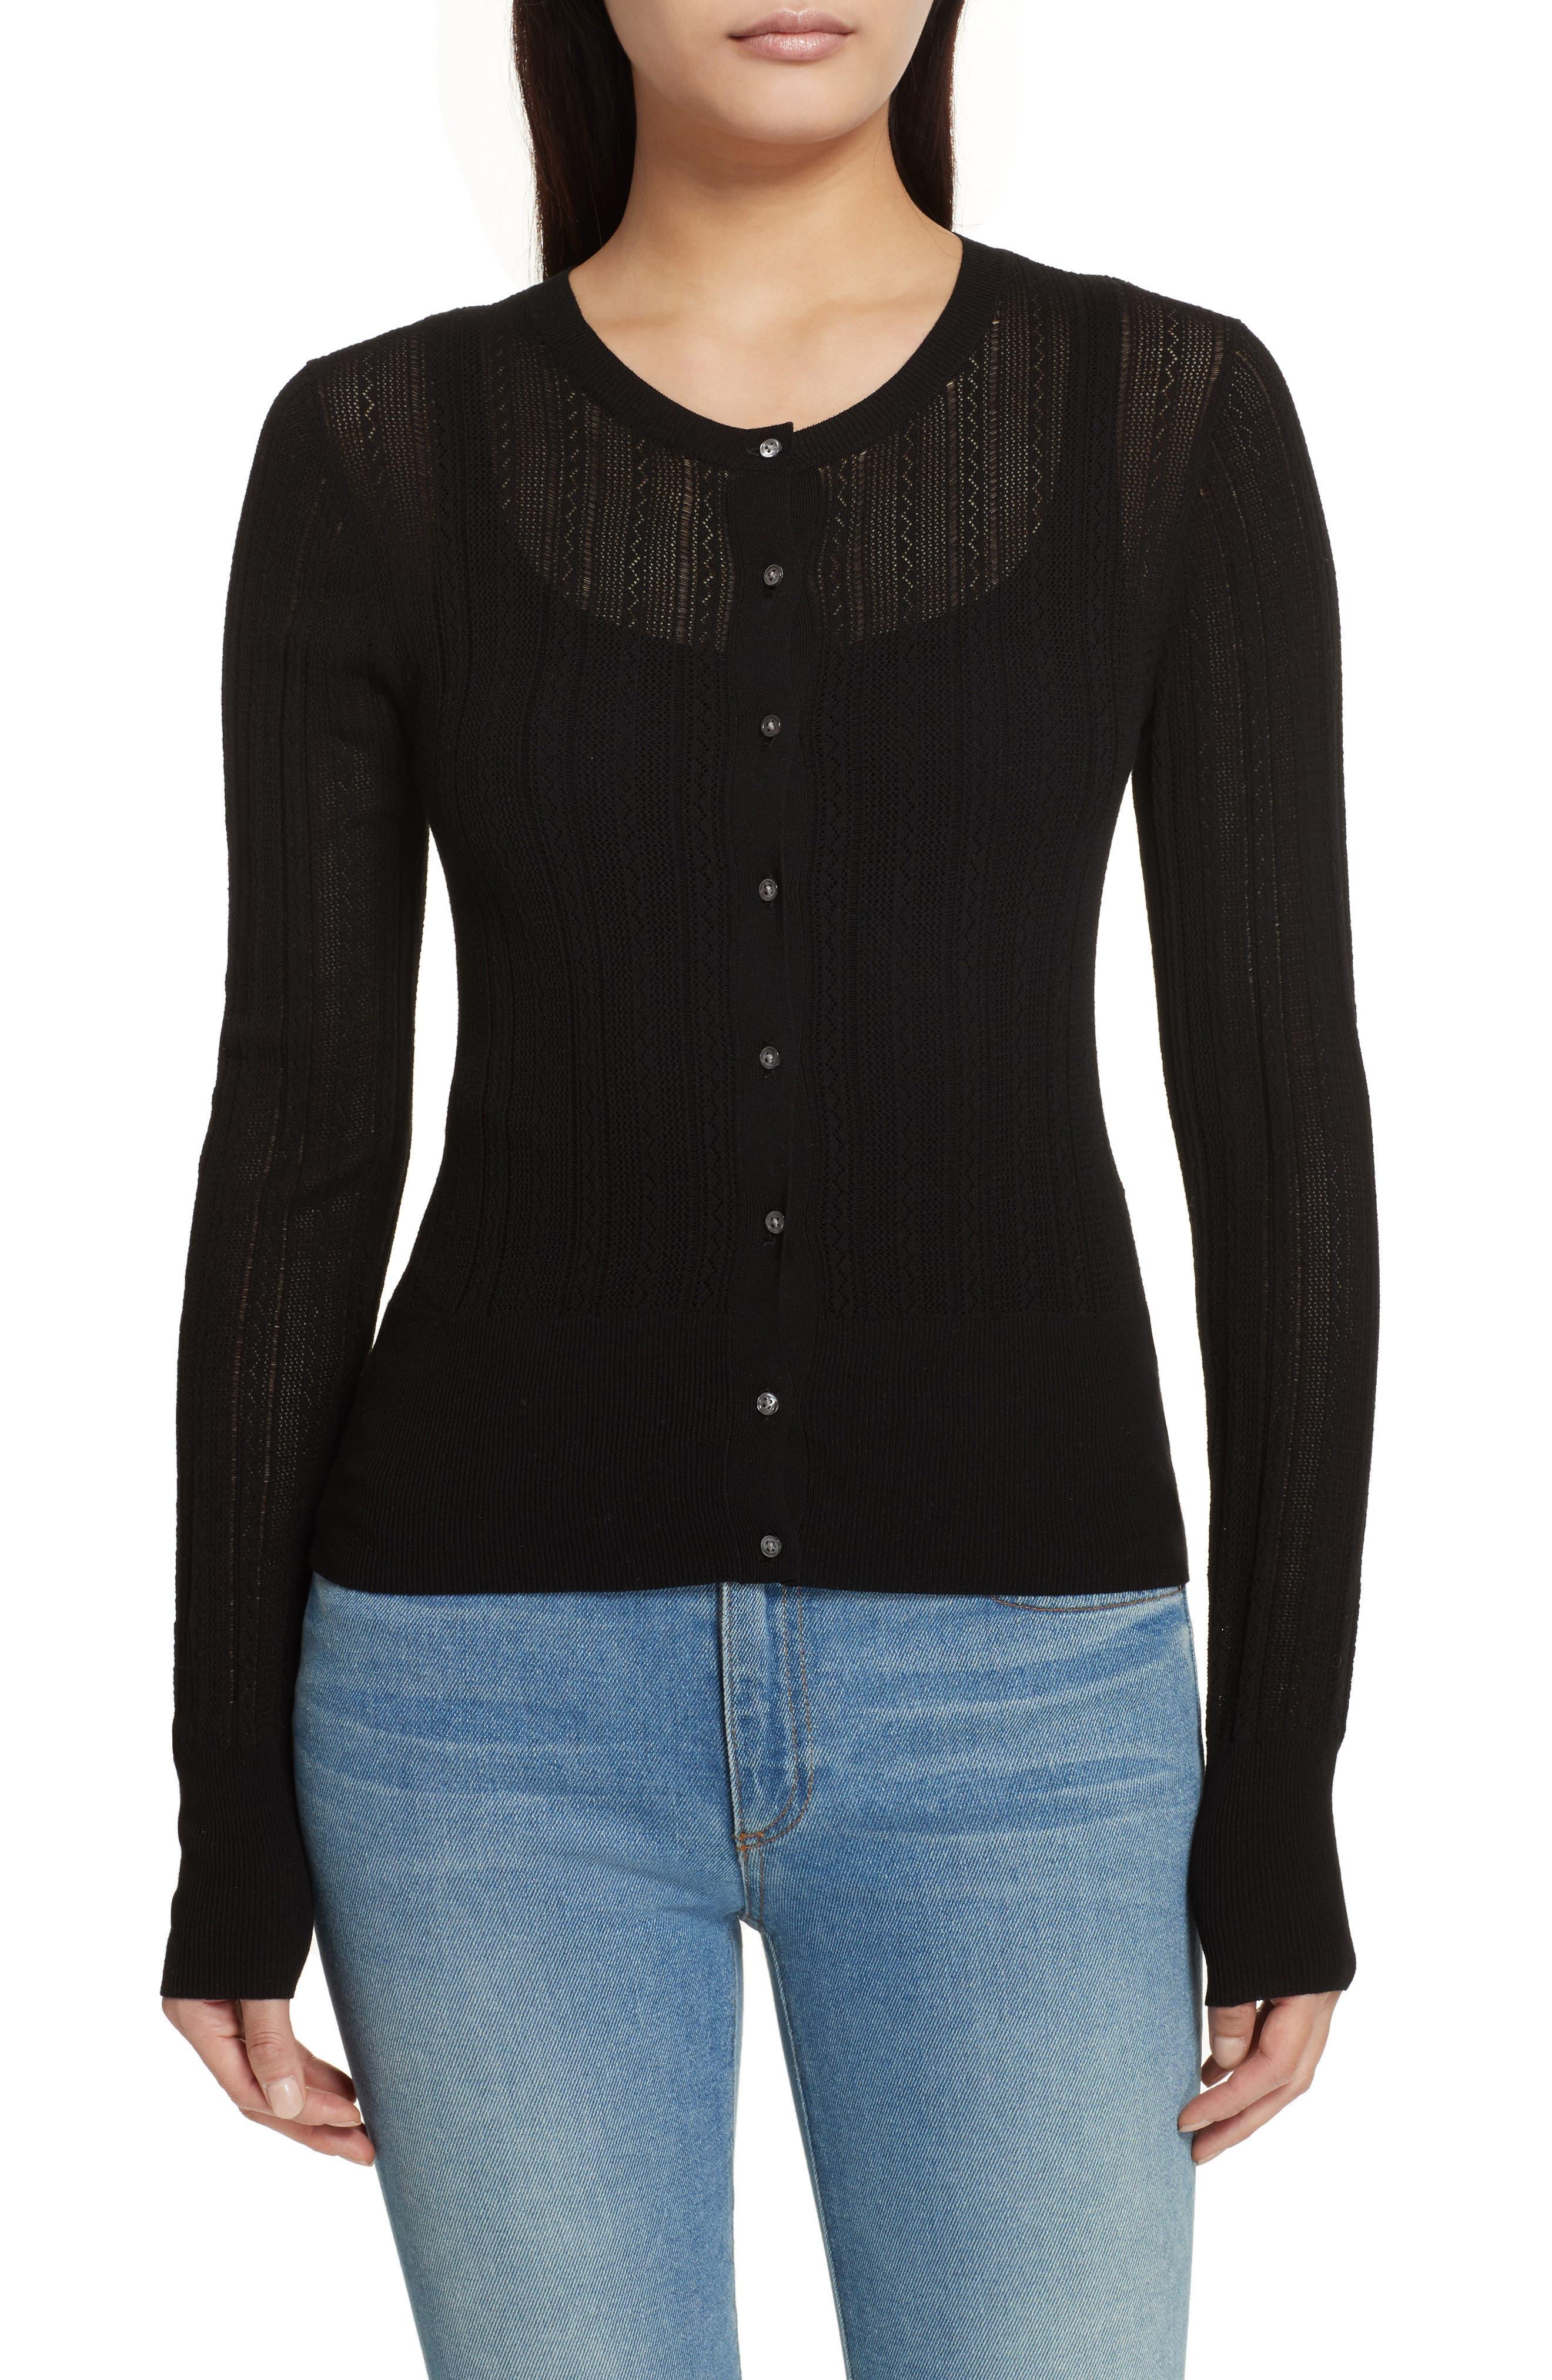 Prosecco Lace Knit Cardigan,                             Main thumbnail 1, color,                             Black